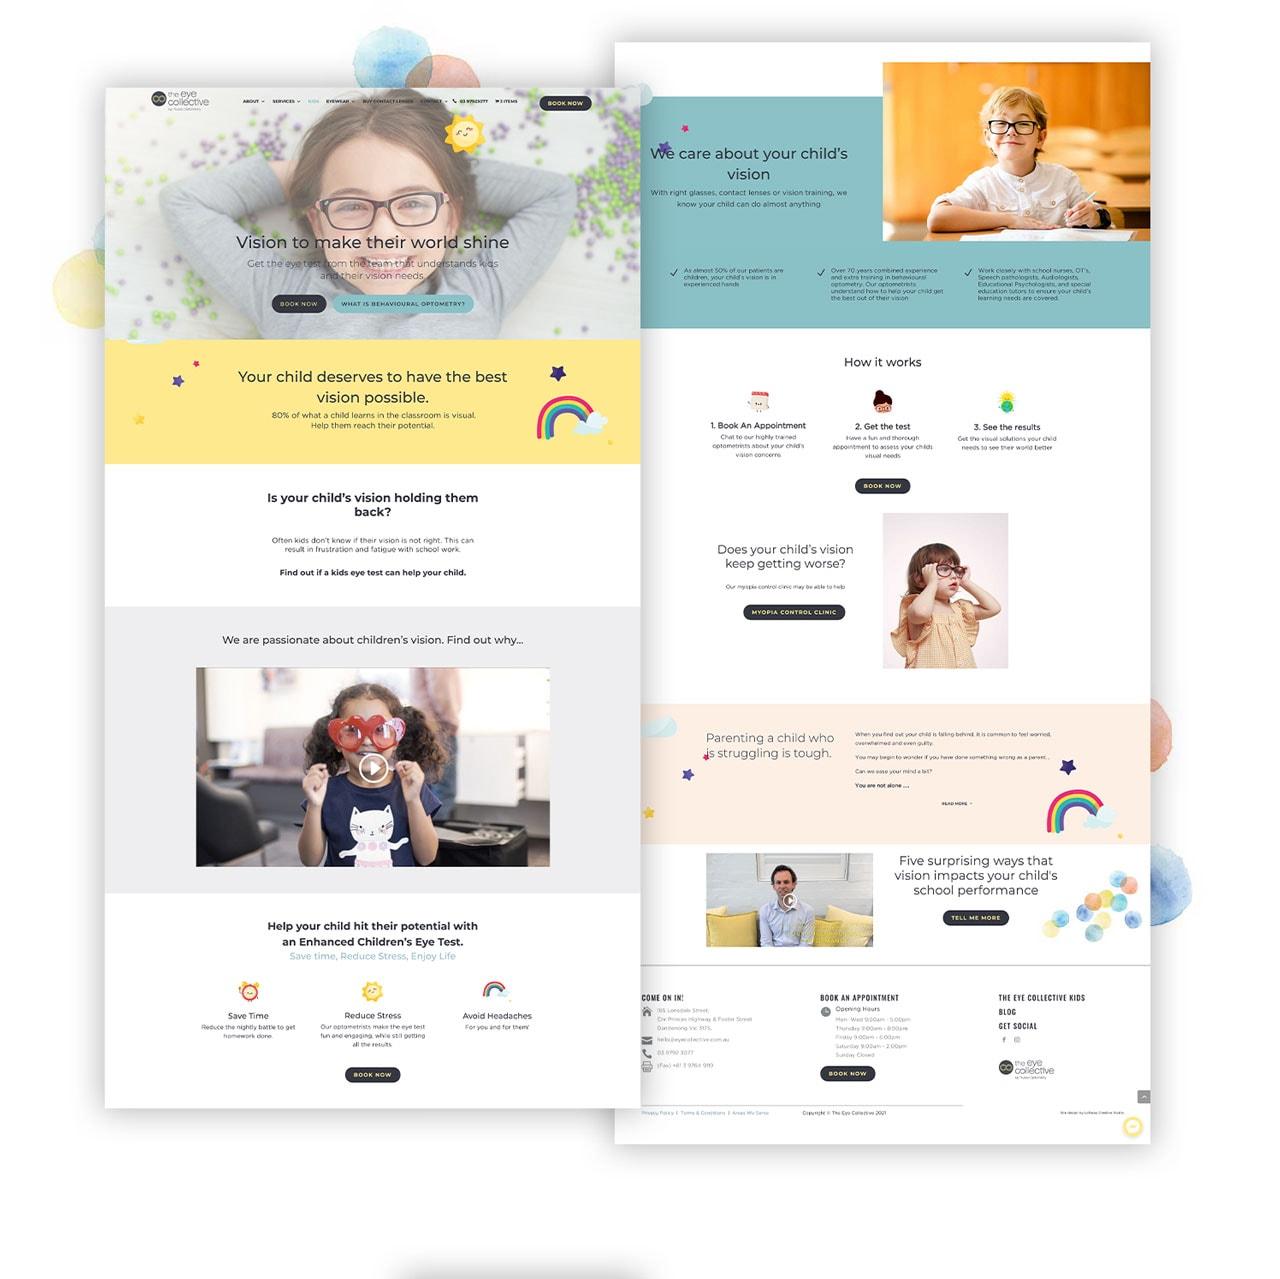 eyecollective optometry for kids website design